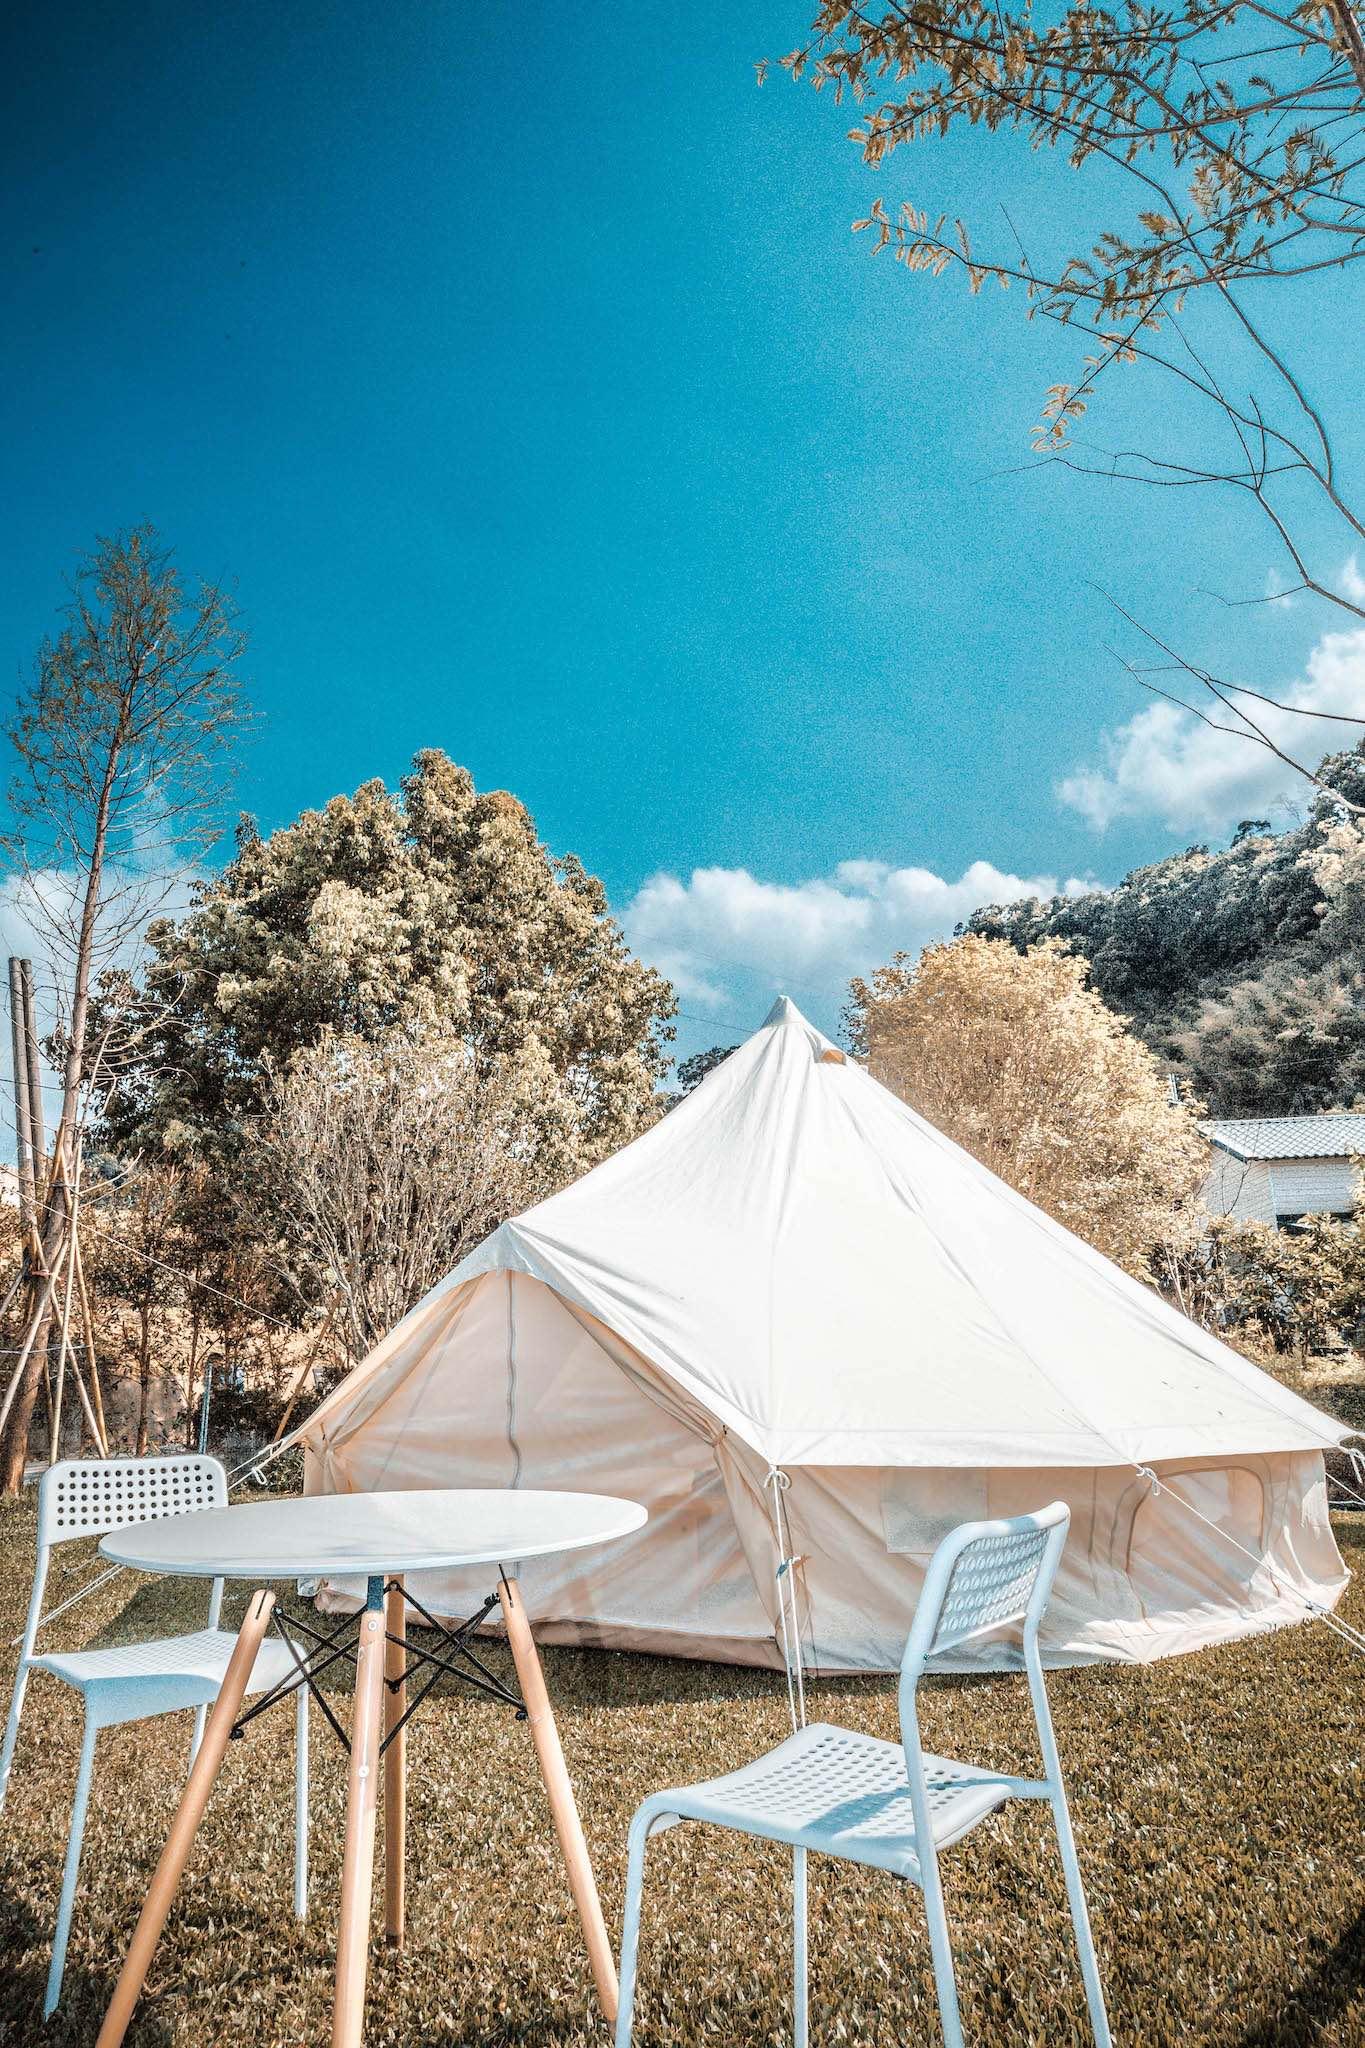 kidsvillage-camp-outside-2